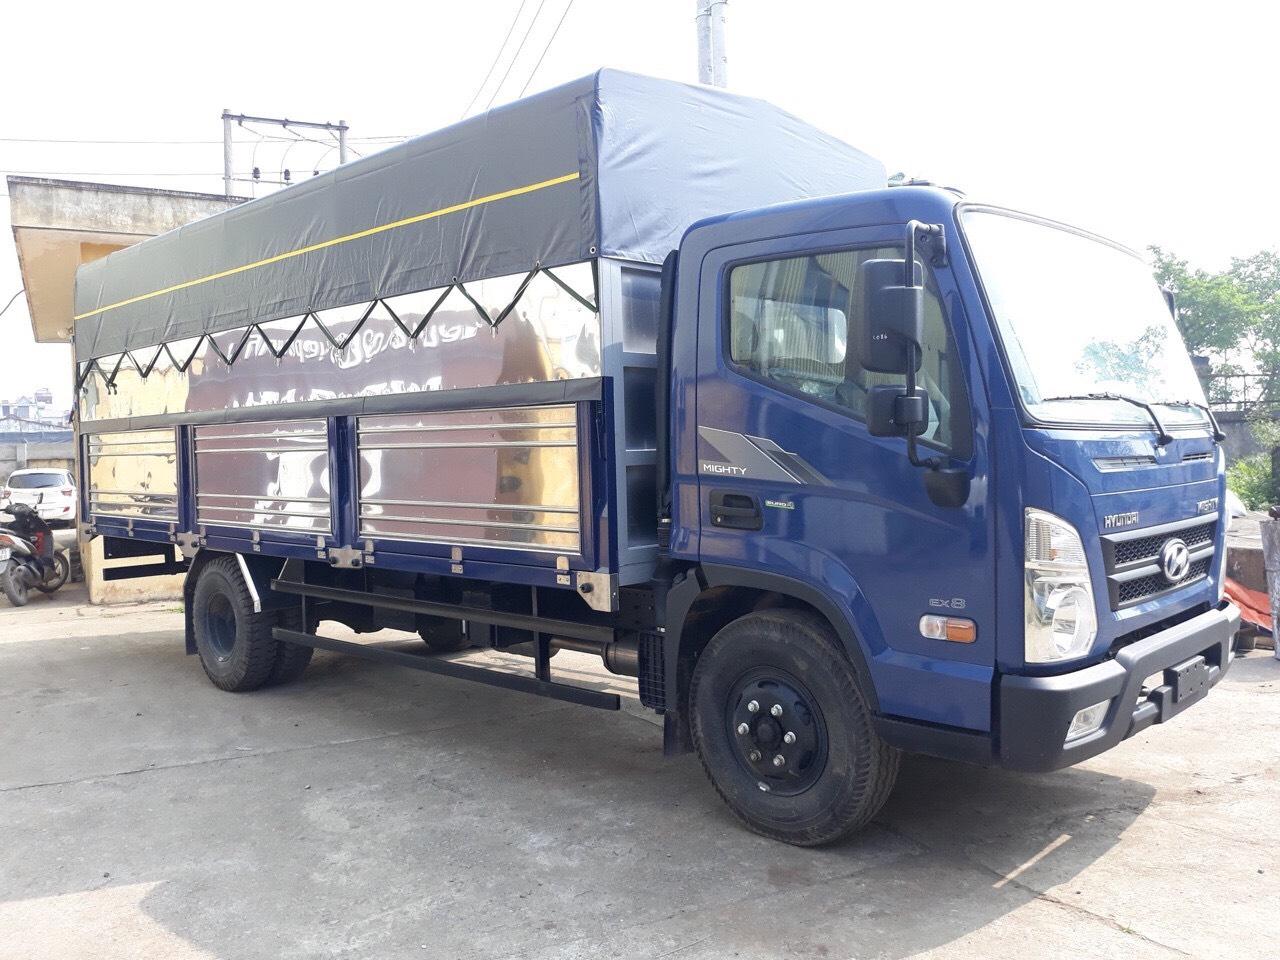 Bán xe tải Hyundai EX8 tại Cao Bằng